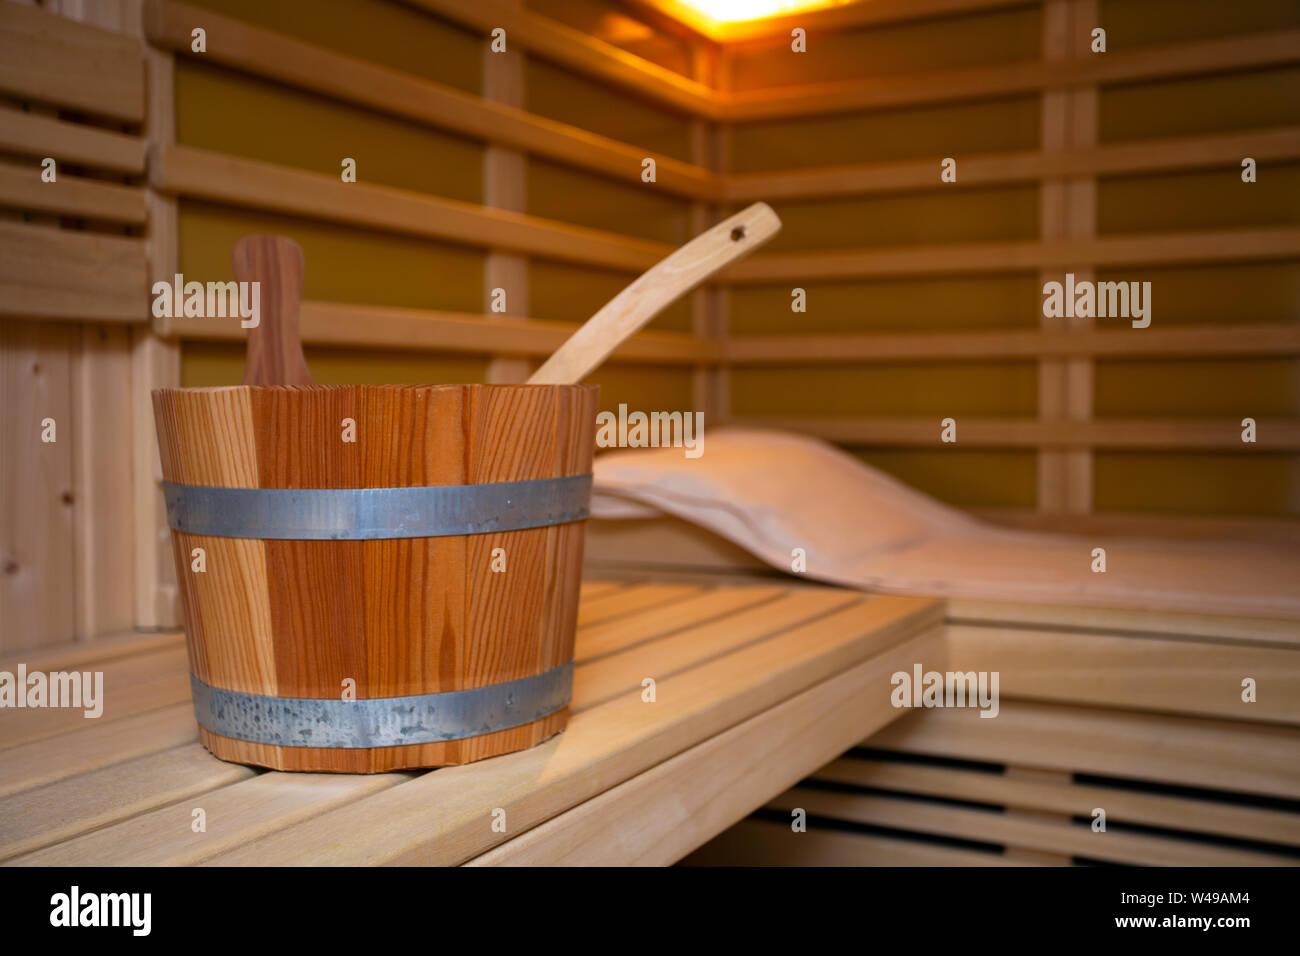 Sauna Holz- bad Dampfbad heißen gesundes Leben, leere ...